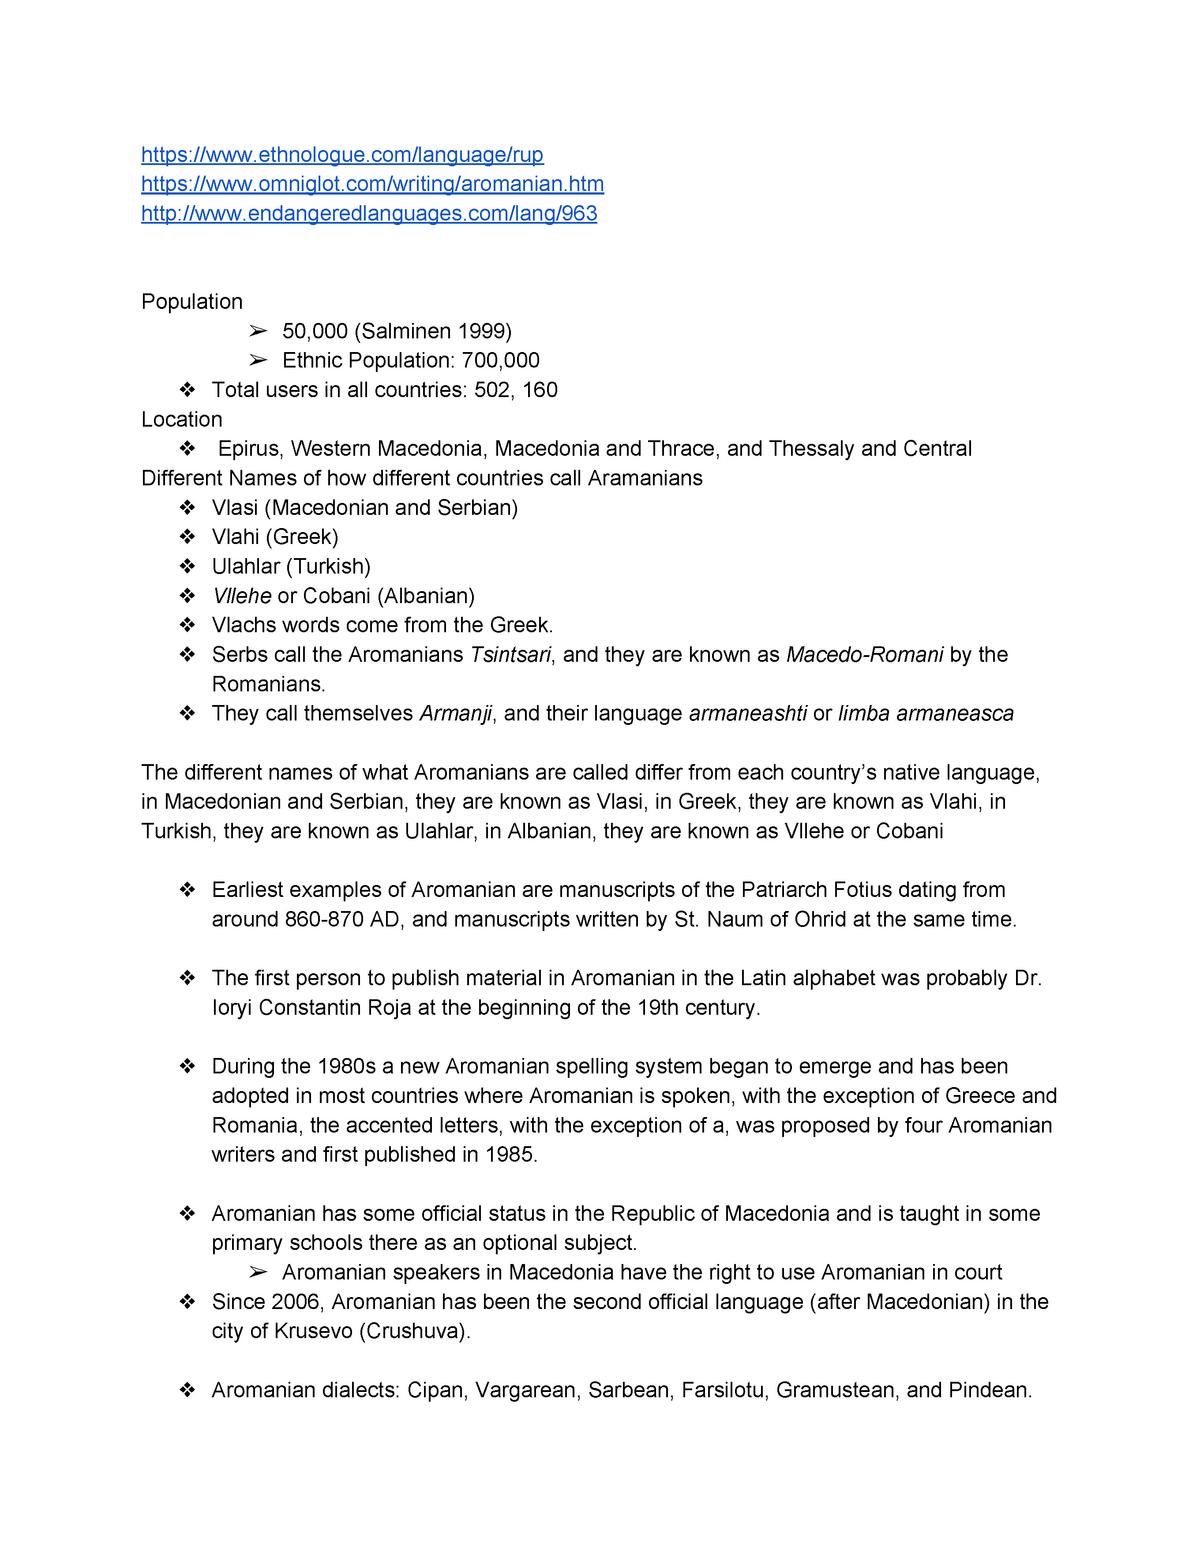 Aromanian Notes - Self Study Course - LING105: Language Endangerment